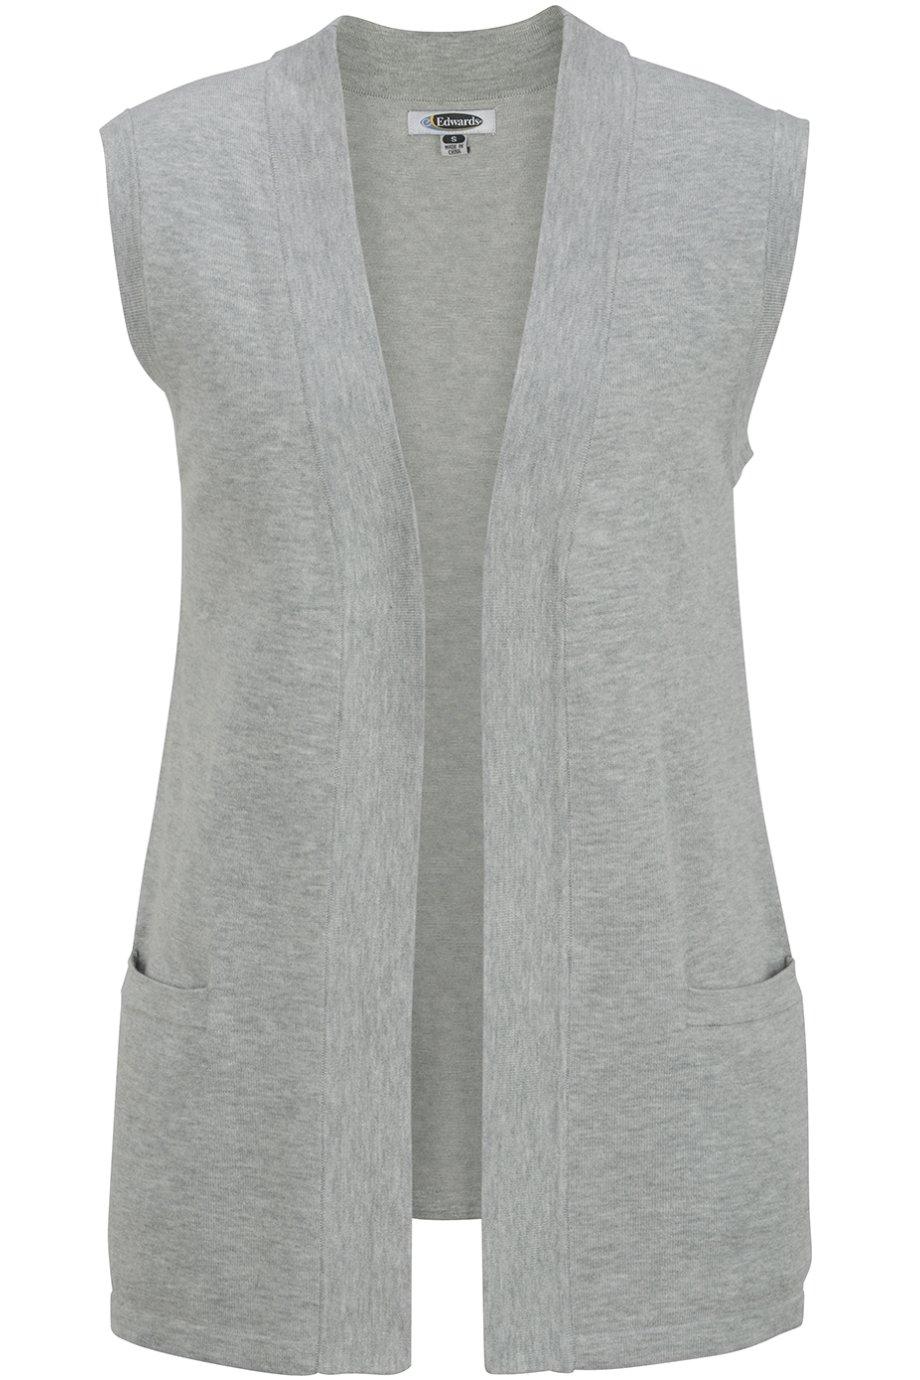 Edwards Women's Open Cardigan Sweater Vest, Grey Heather, X-Large